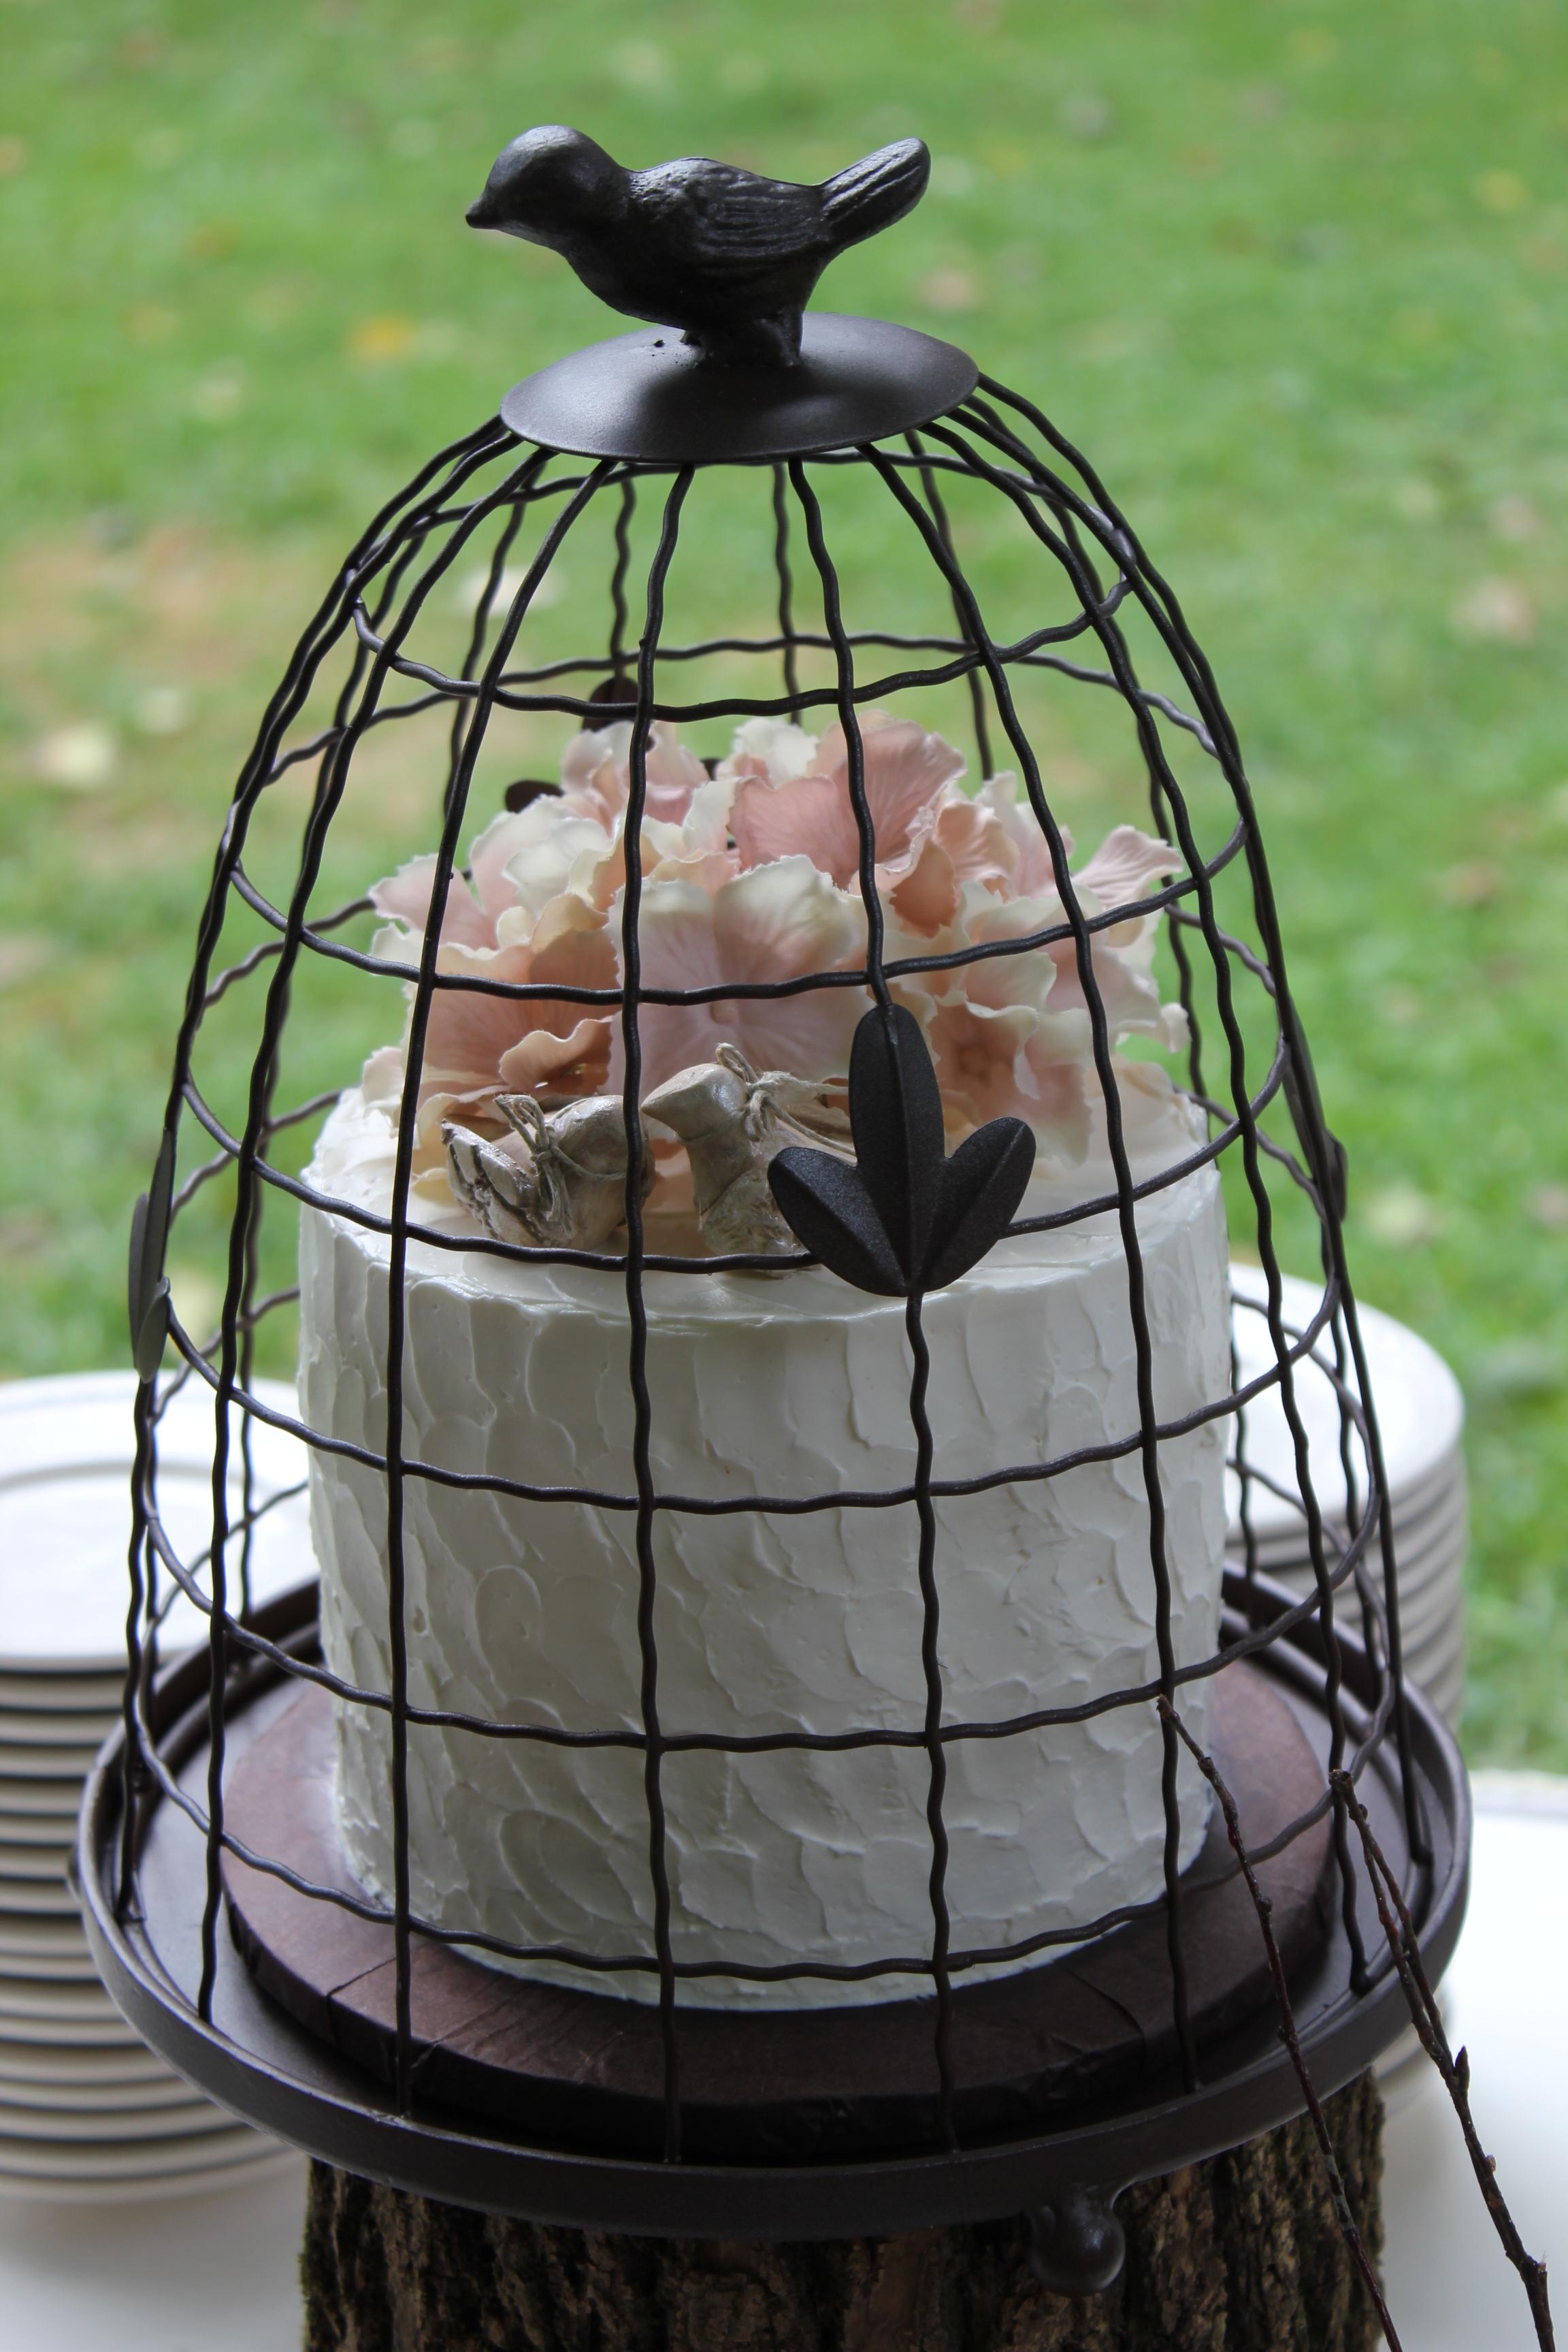 bella chelsea bird cage.JPG